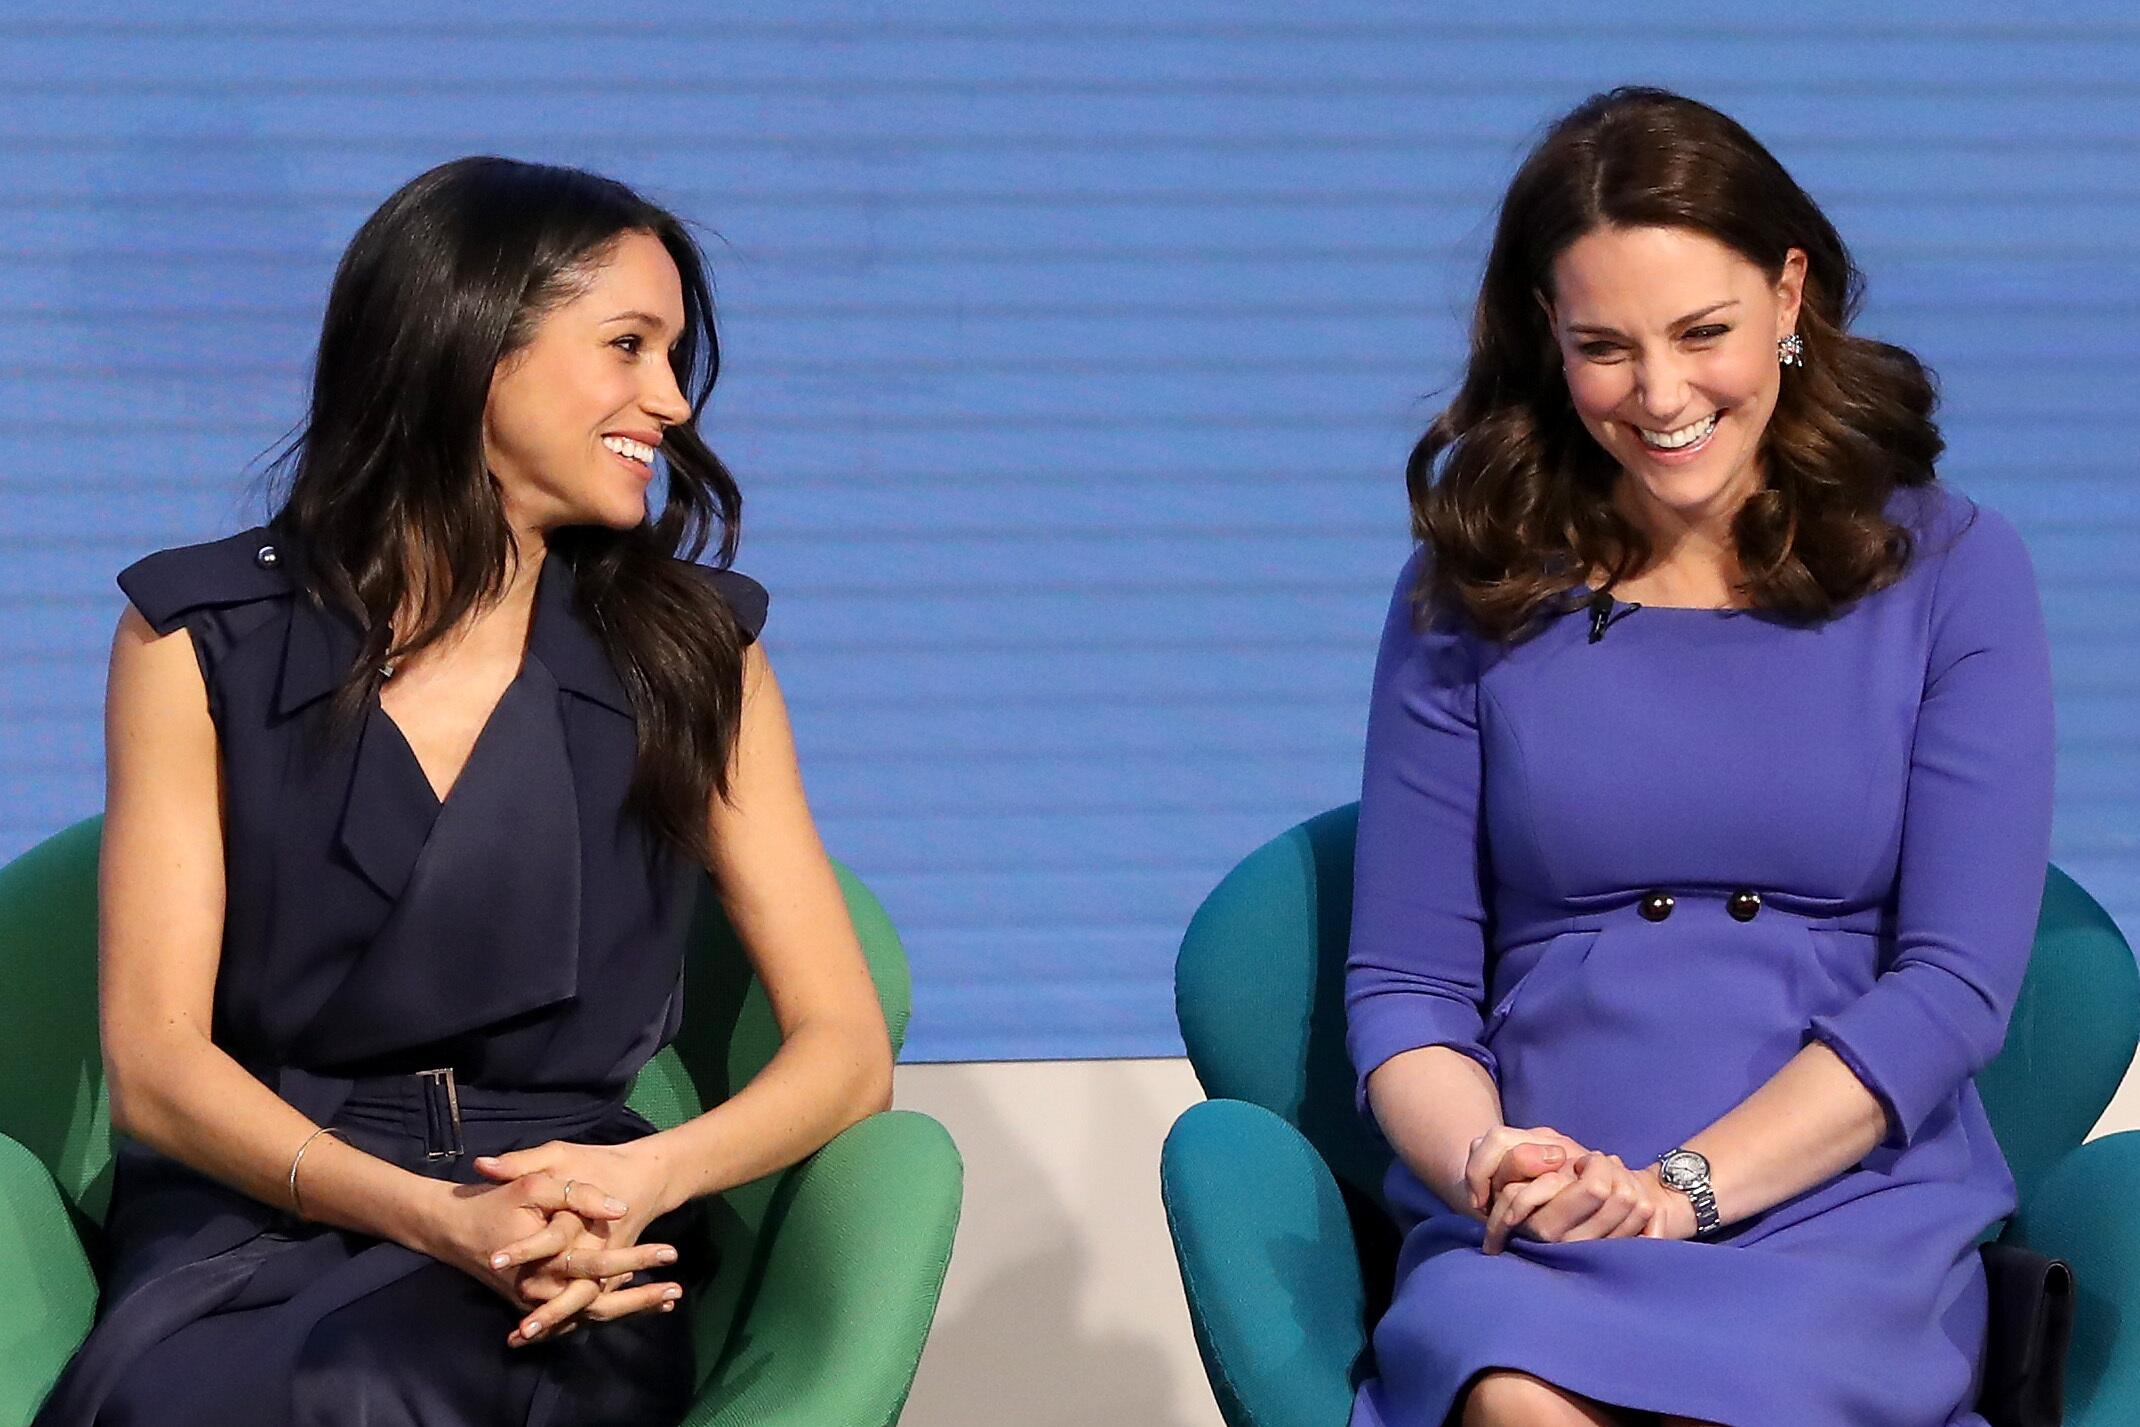 Bild zu Meghan Markle, Herzogin Kate, Prinz Harry, Verlobte, Prinz William, Royals